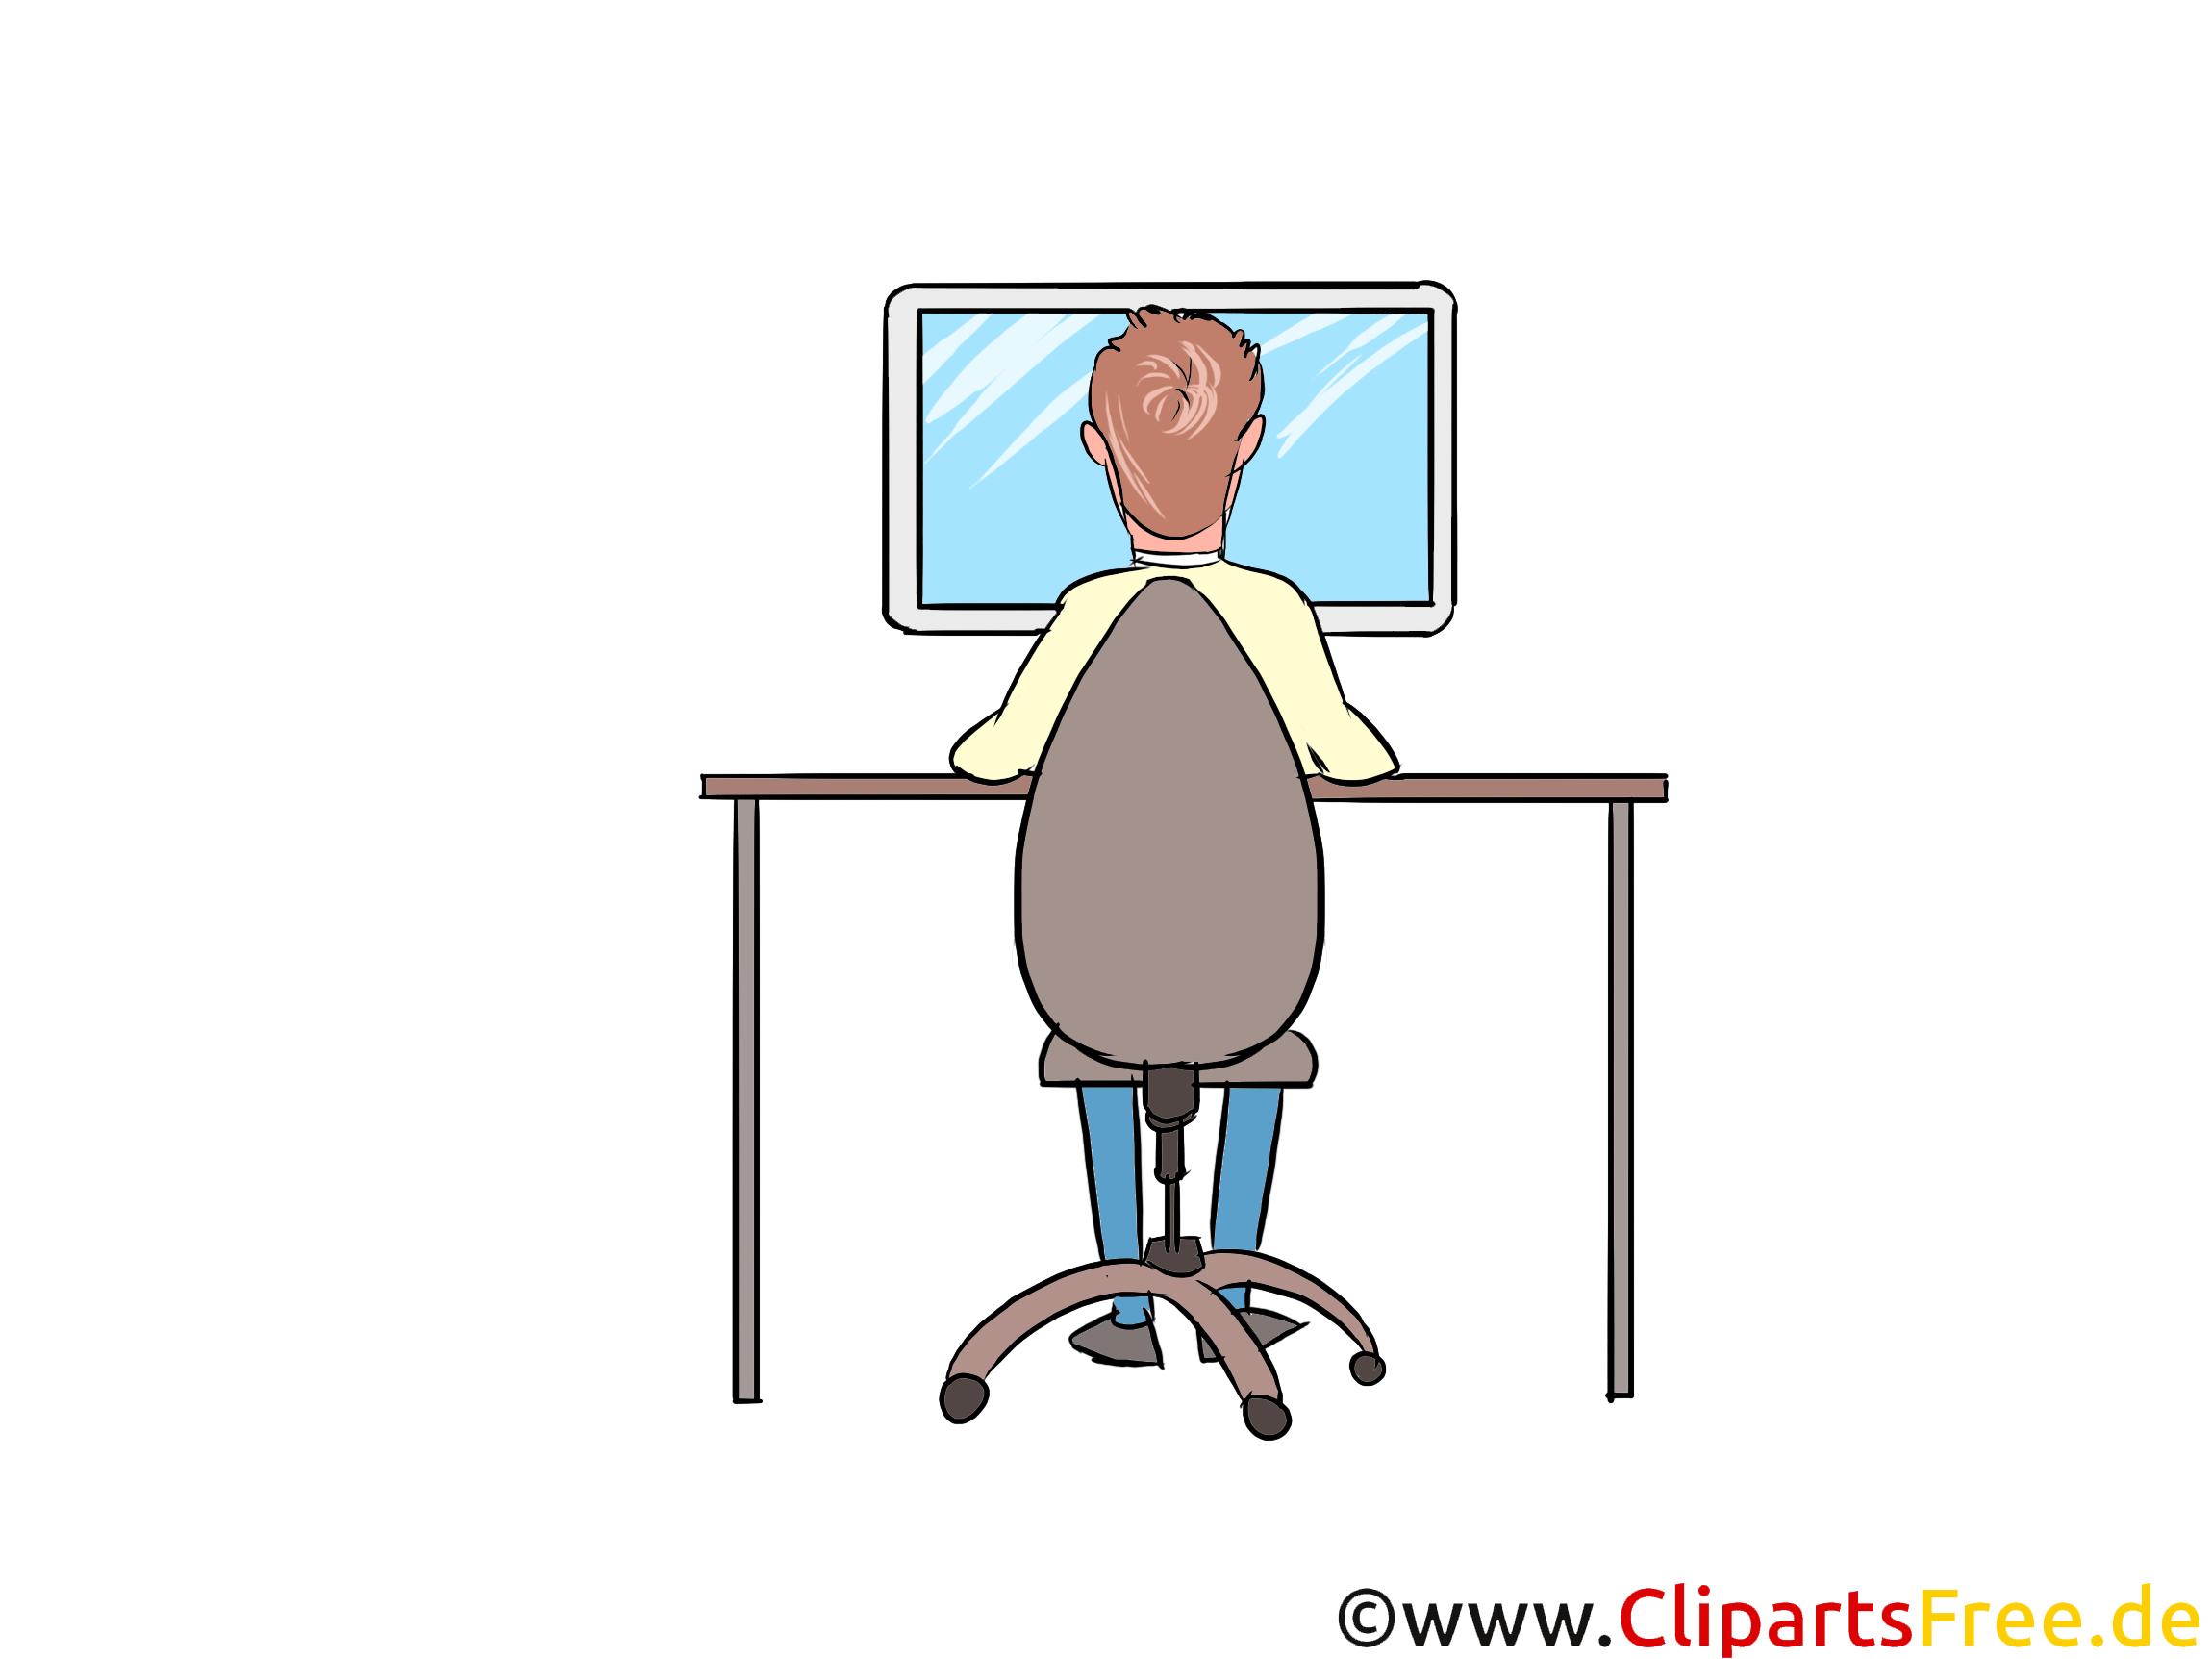 Mann arbeitet am PC, Computer Clipart, Bild, Illustration